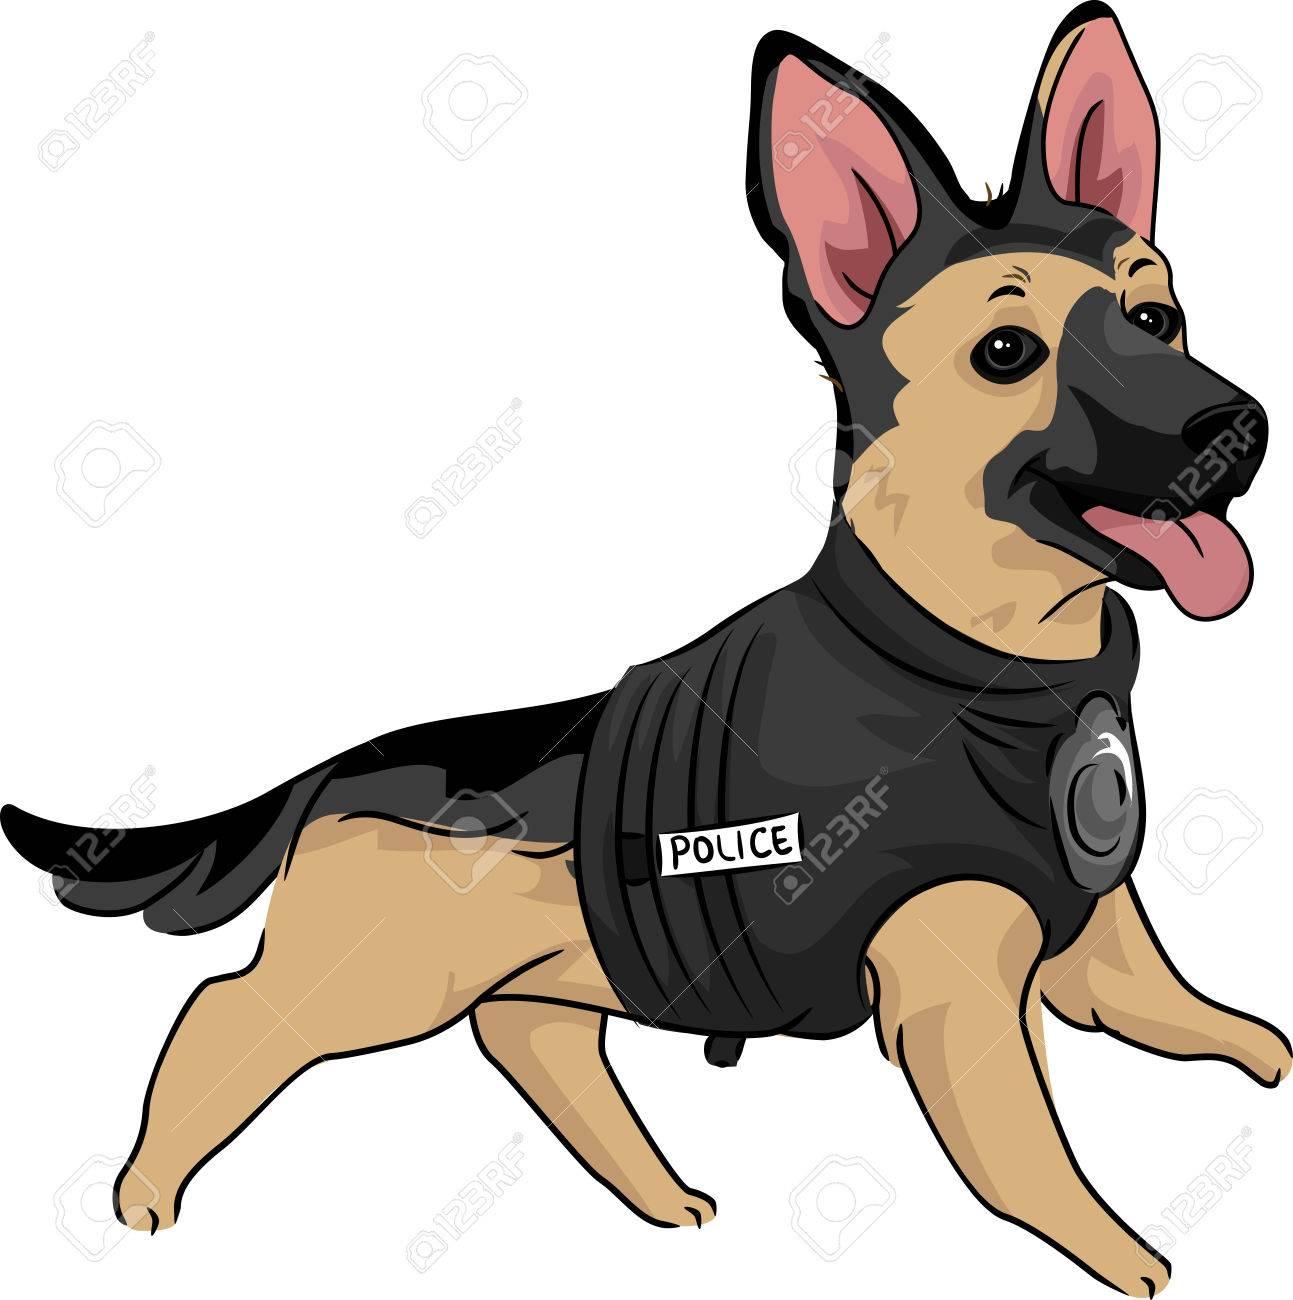 Animal Illustration Of A Cute German Shepherd Puppy In A Training